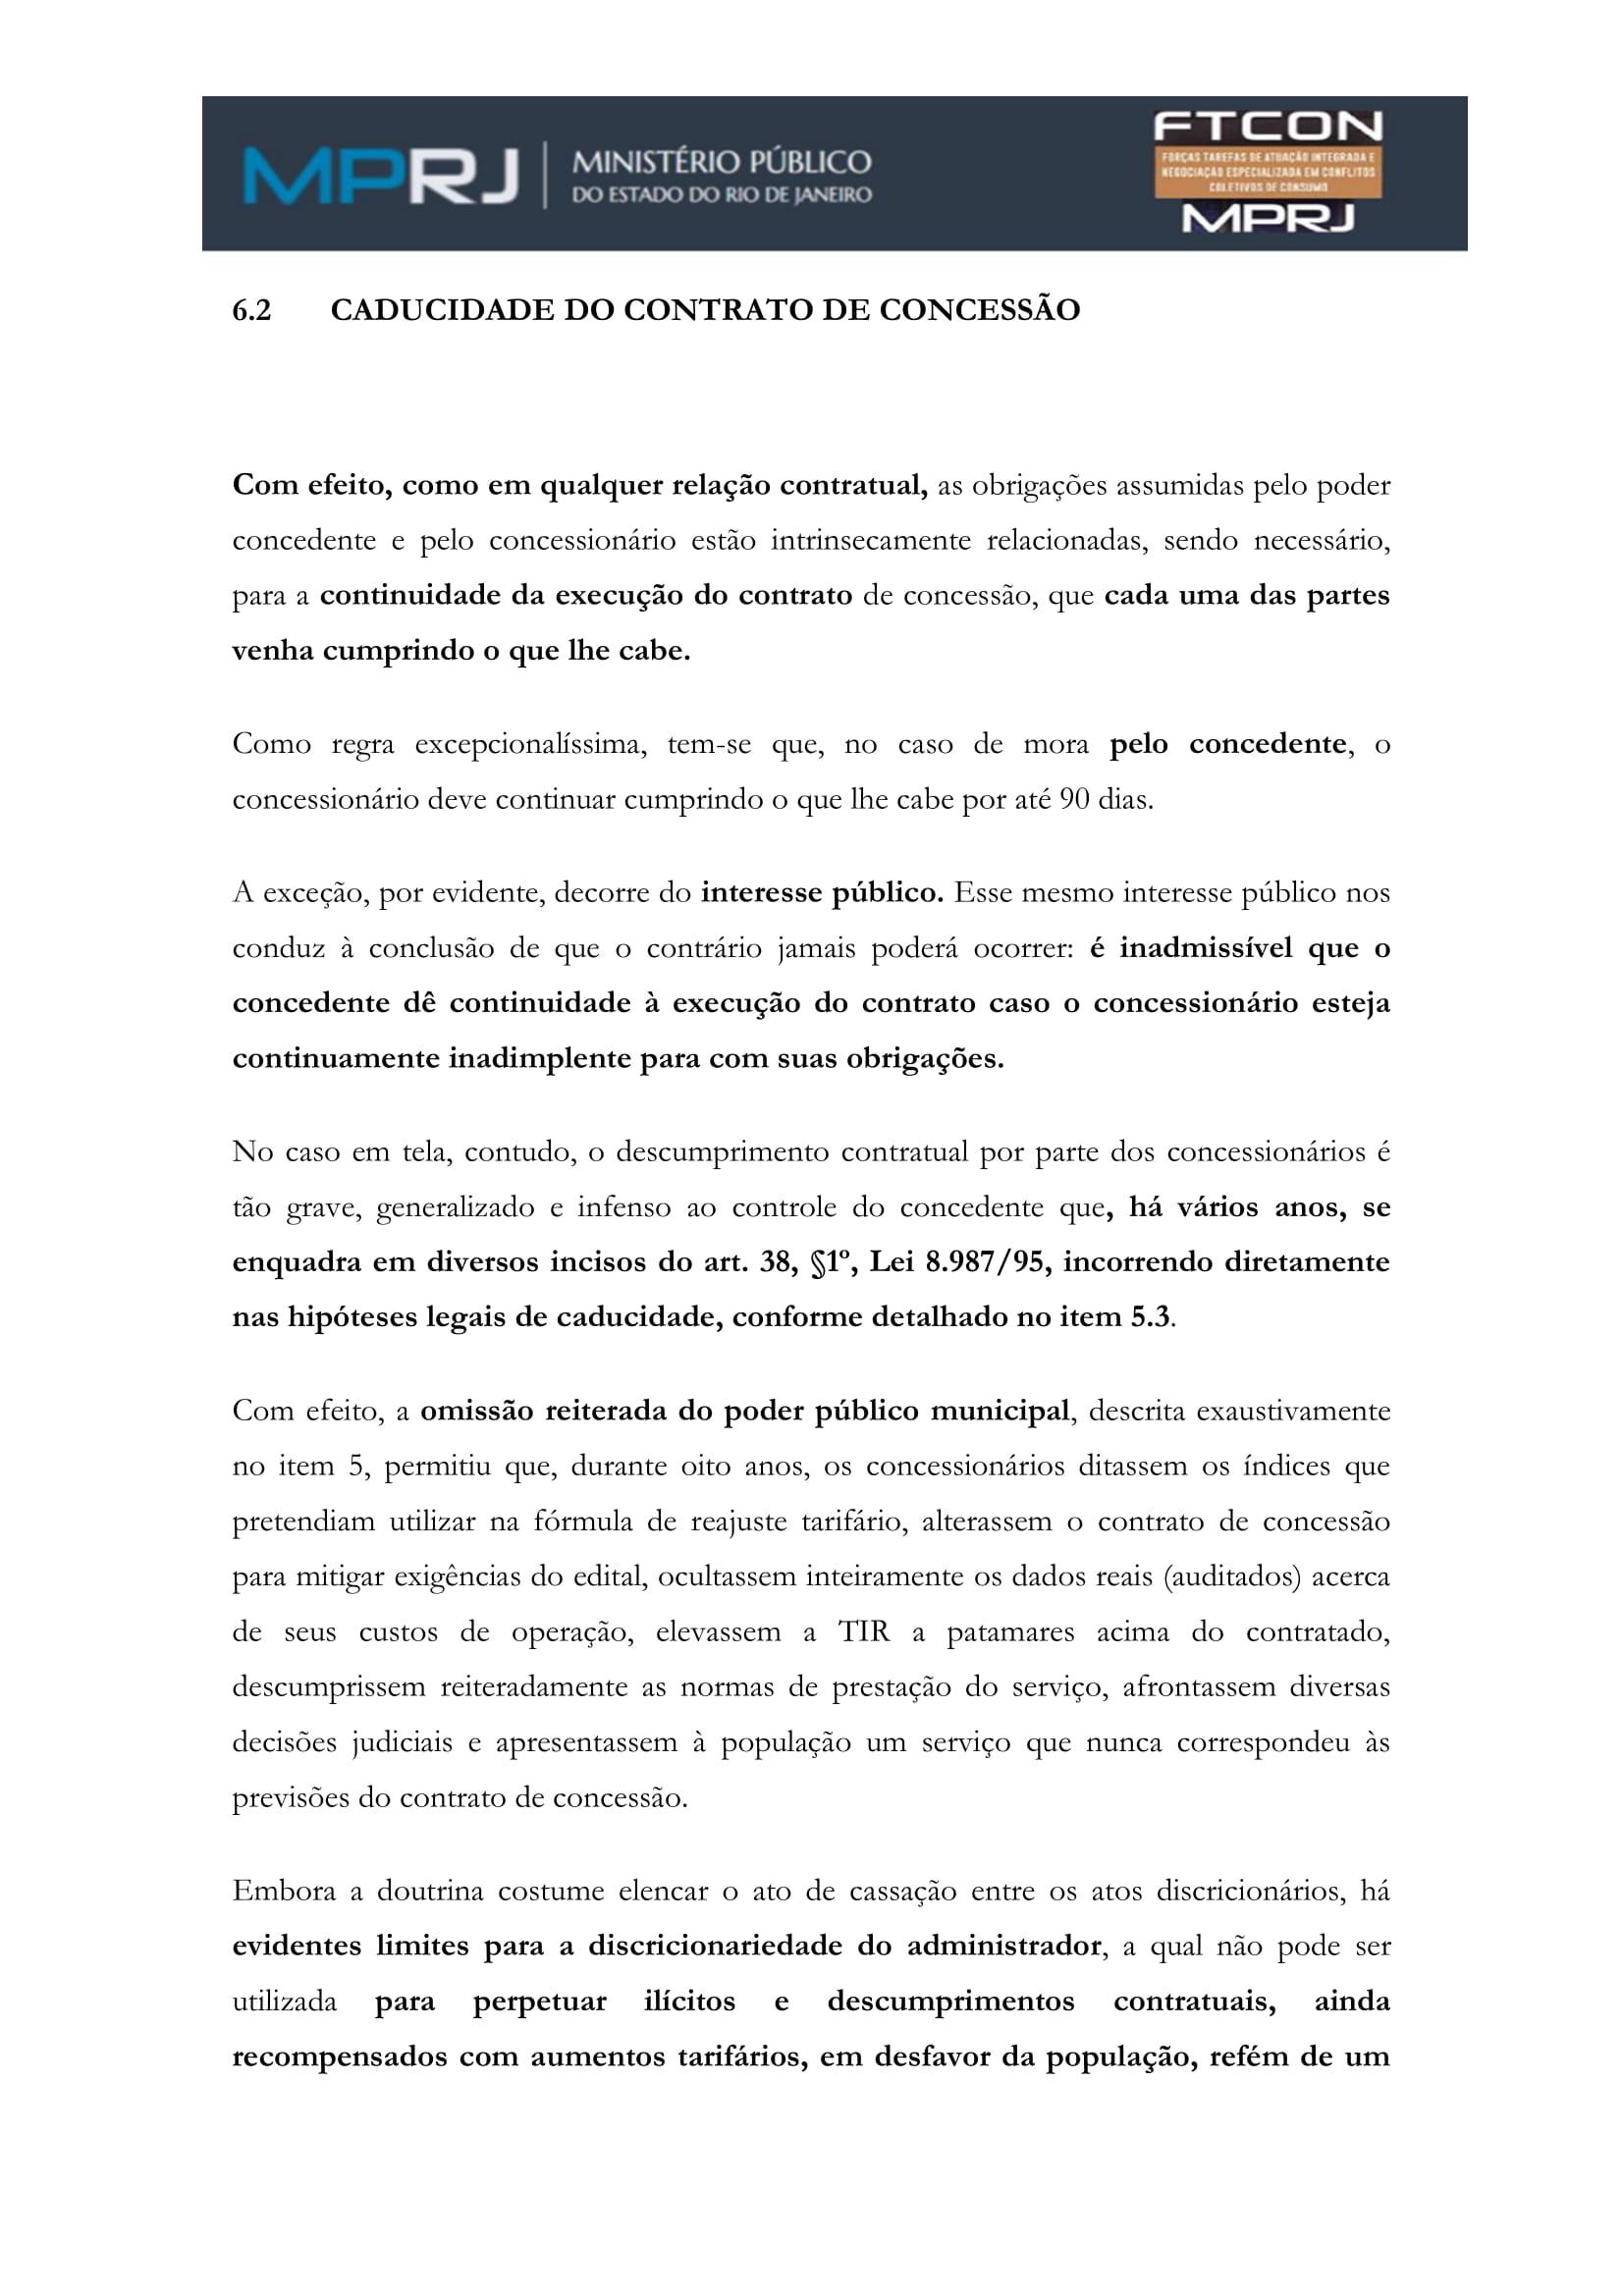 acp_caducidade_onibus_dr_rt-121